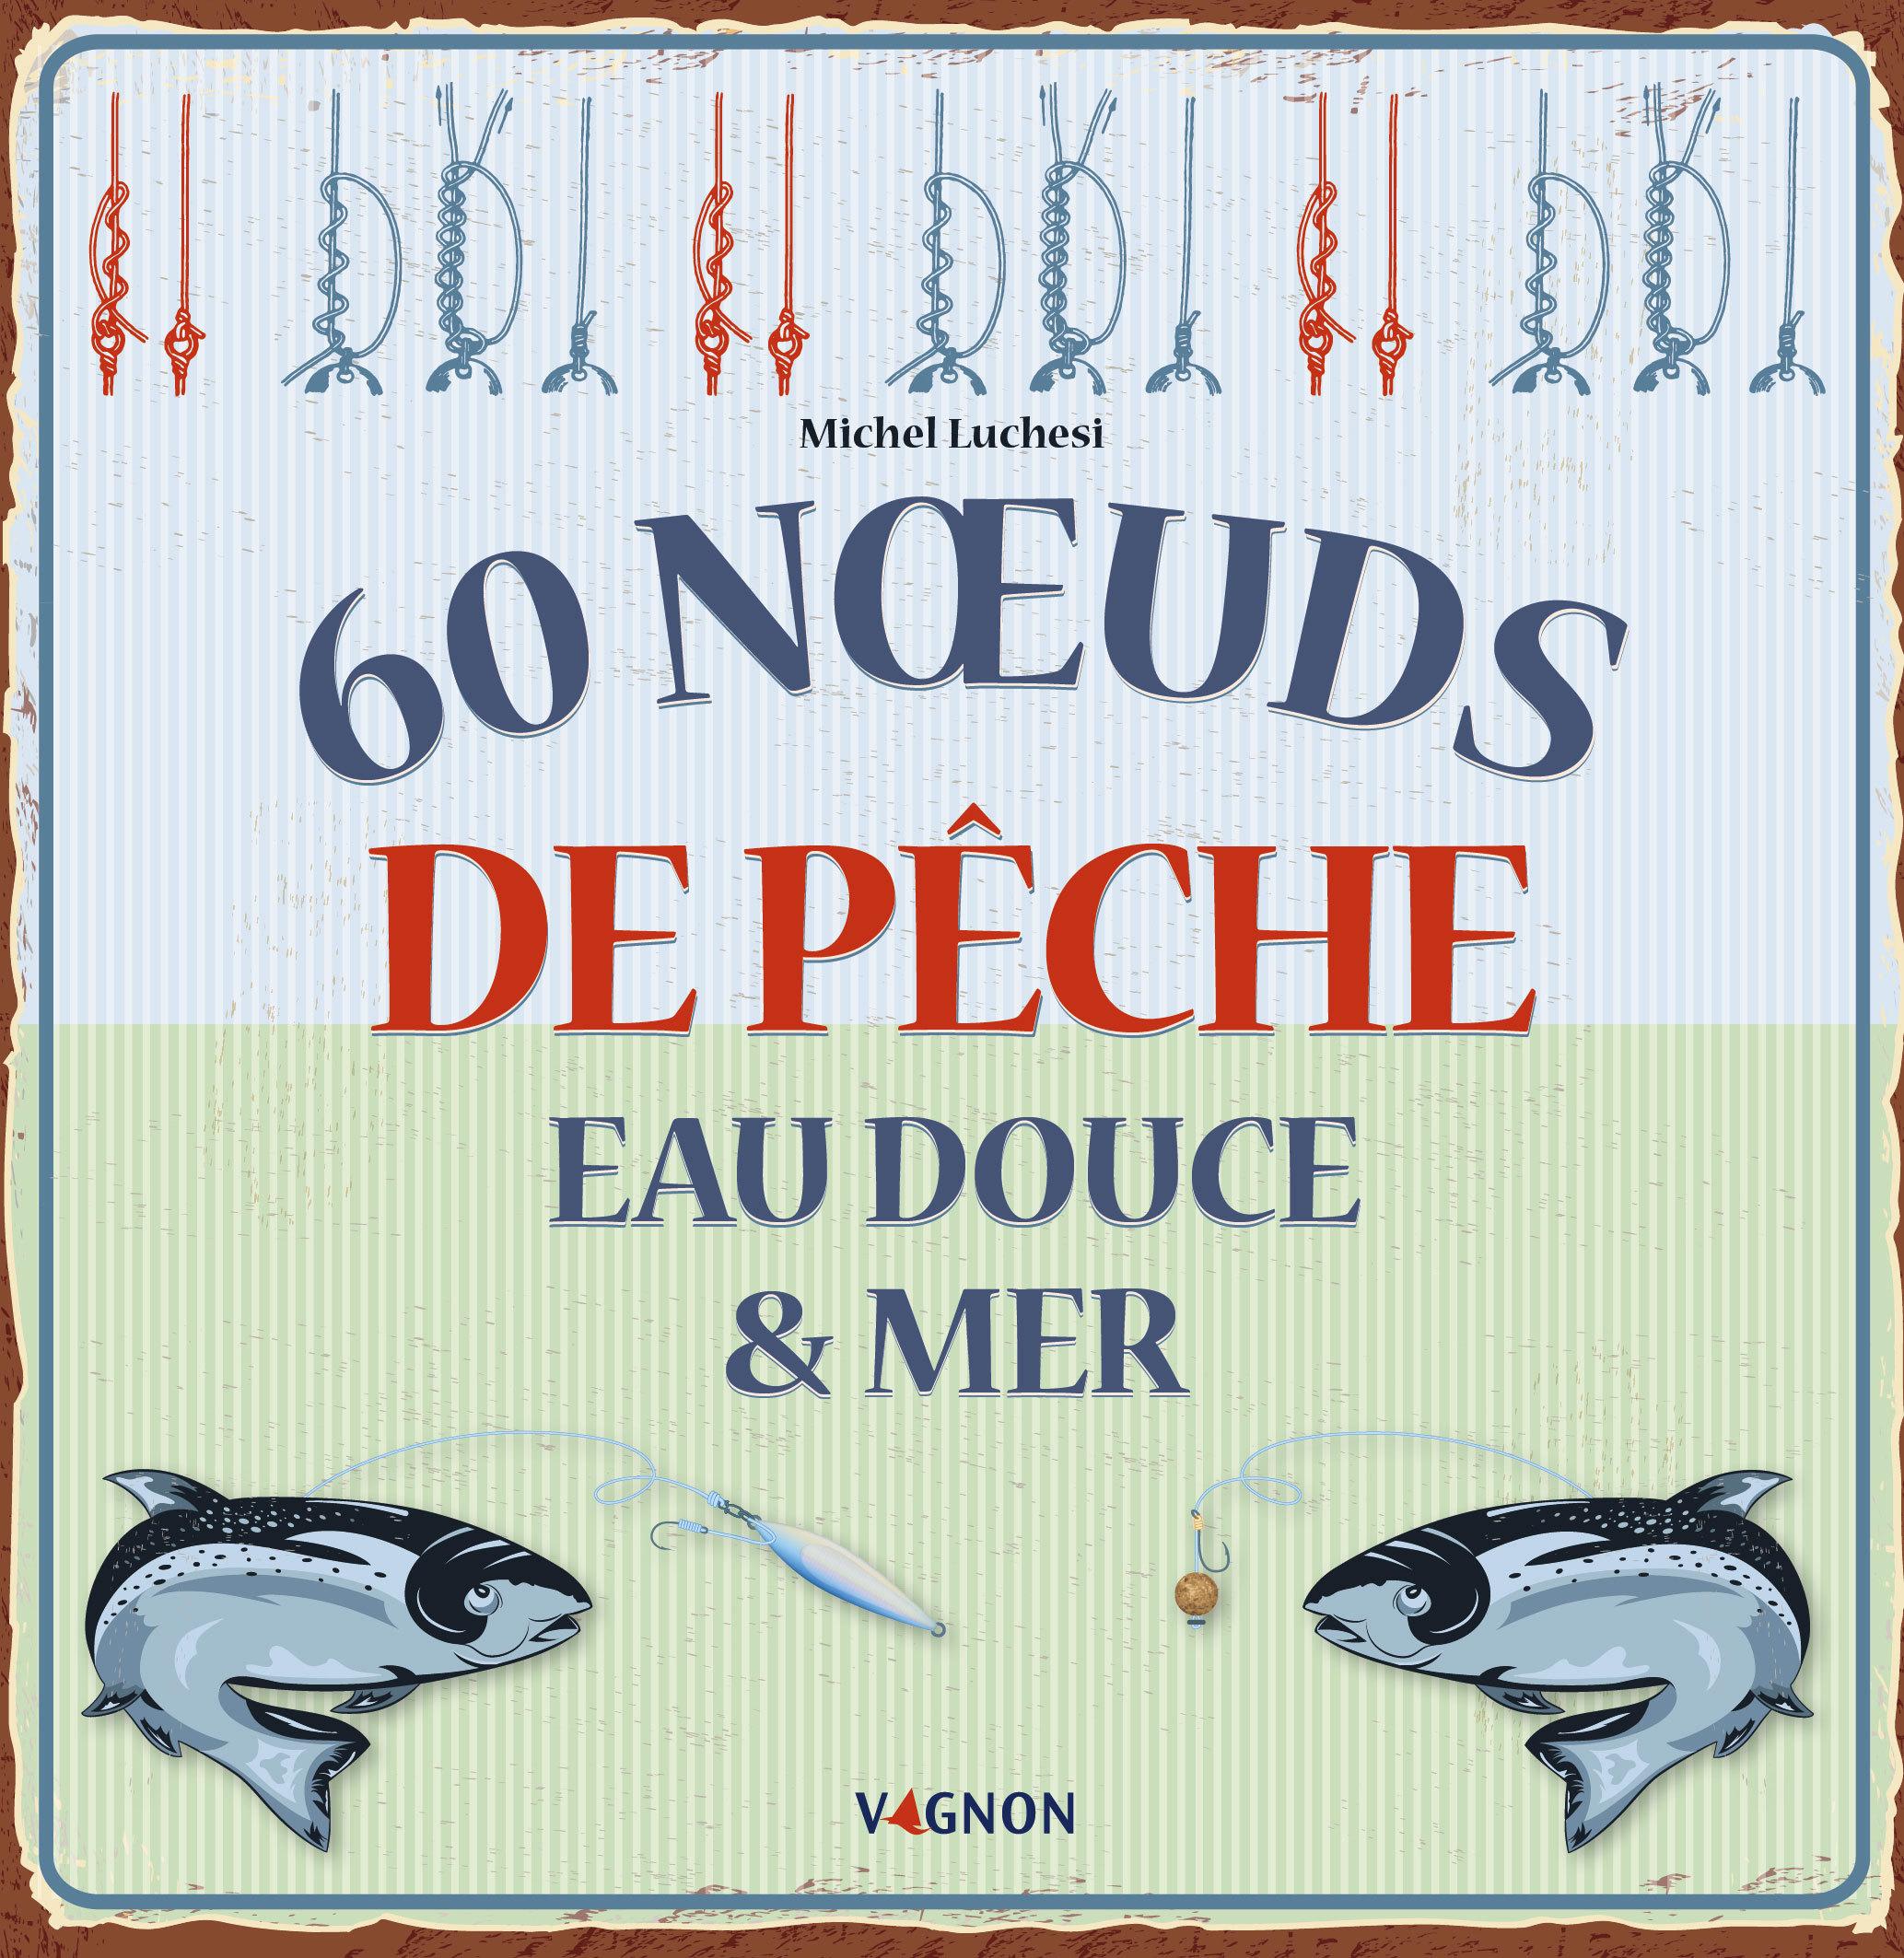 60 NOEUDS DE PECHE EAU DOUCE & MER